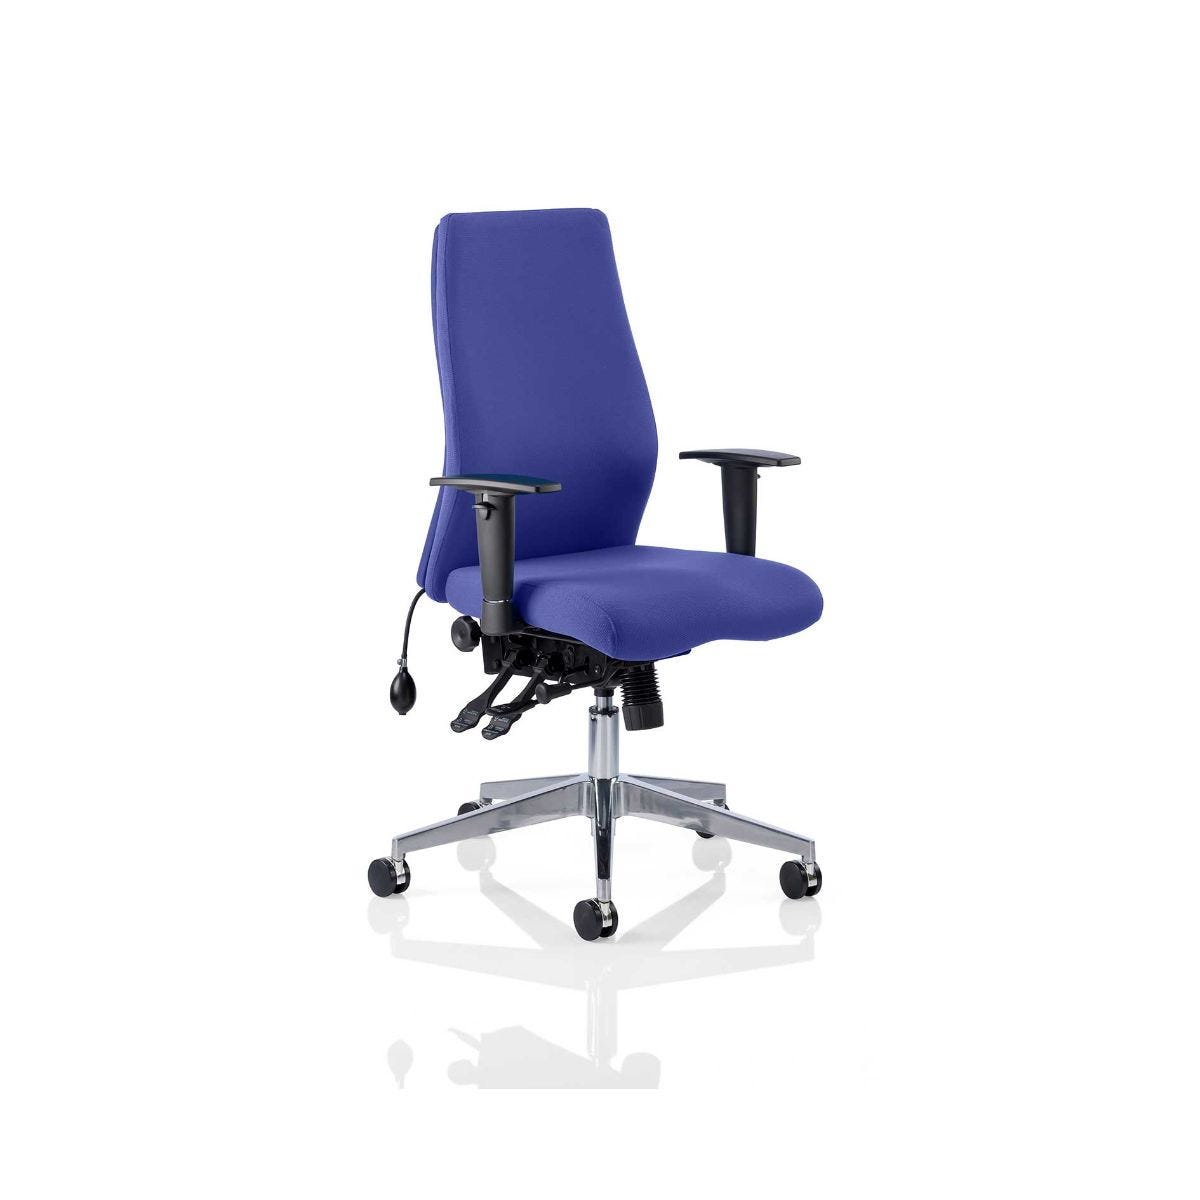 Onyx Bespoke Office Chair, Serene